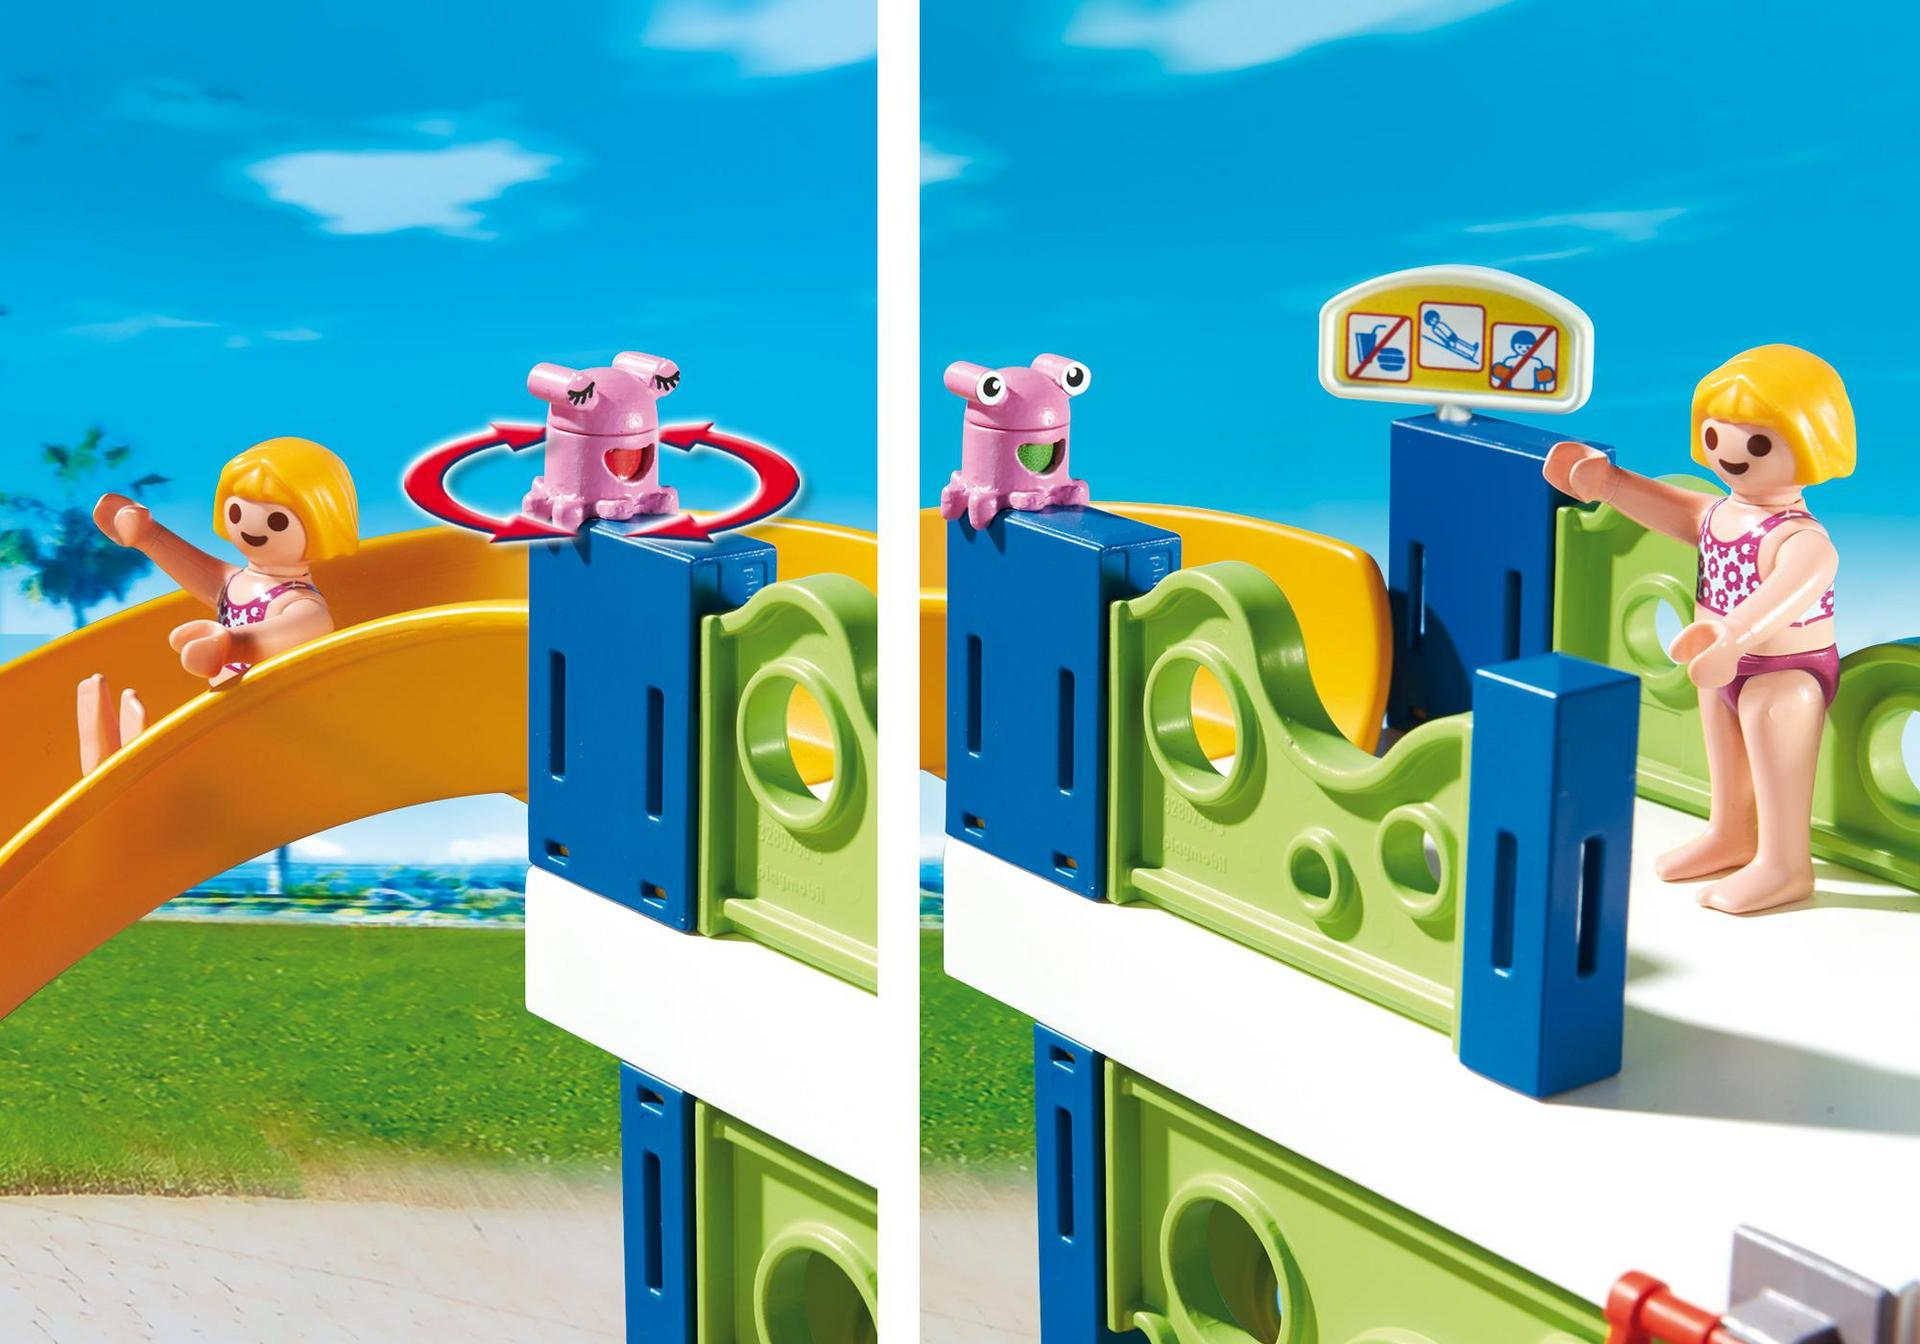 Parque acu tico con toboganes 6669 playmobil espa a for Playmobil piscina con tobogan